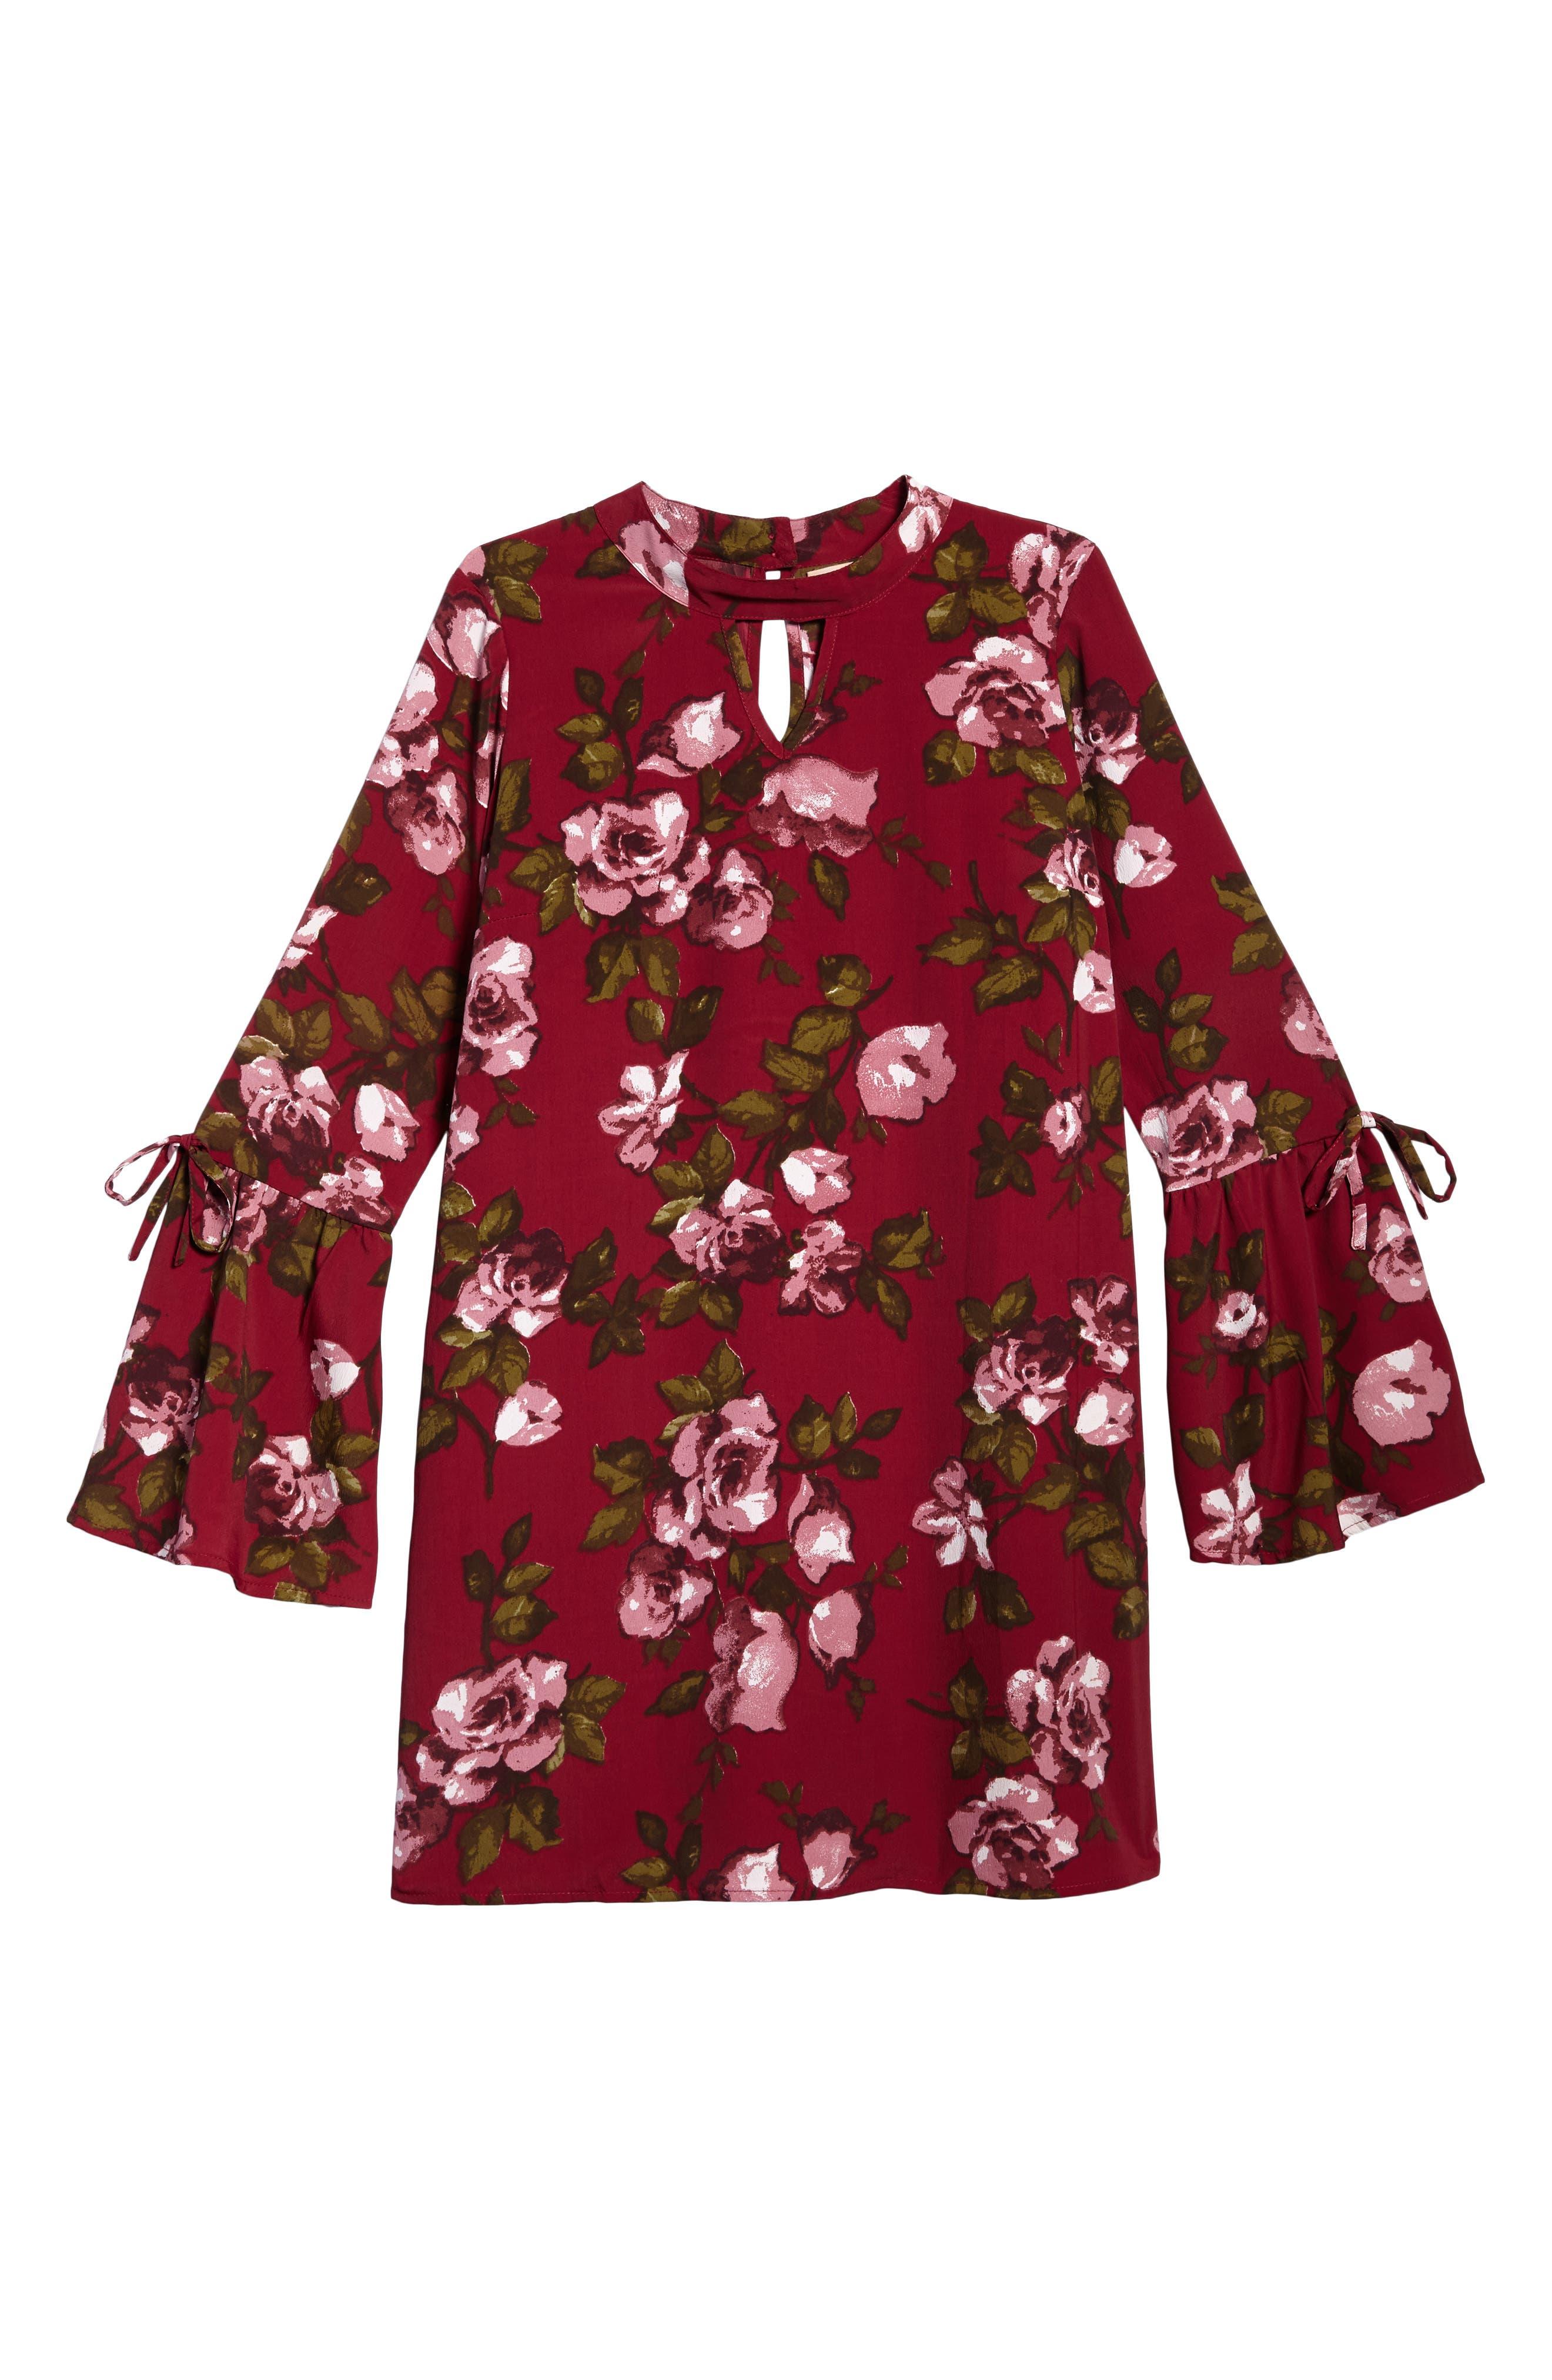 Main Image - Zoe and Rose Print Bell Sleeve Dress (Big Girls)